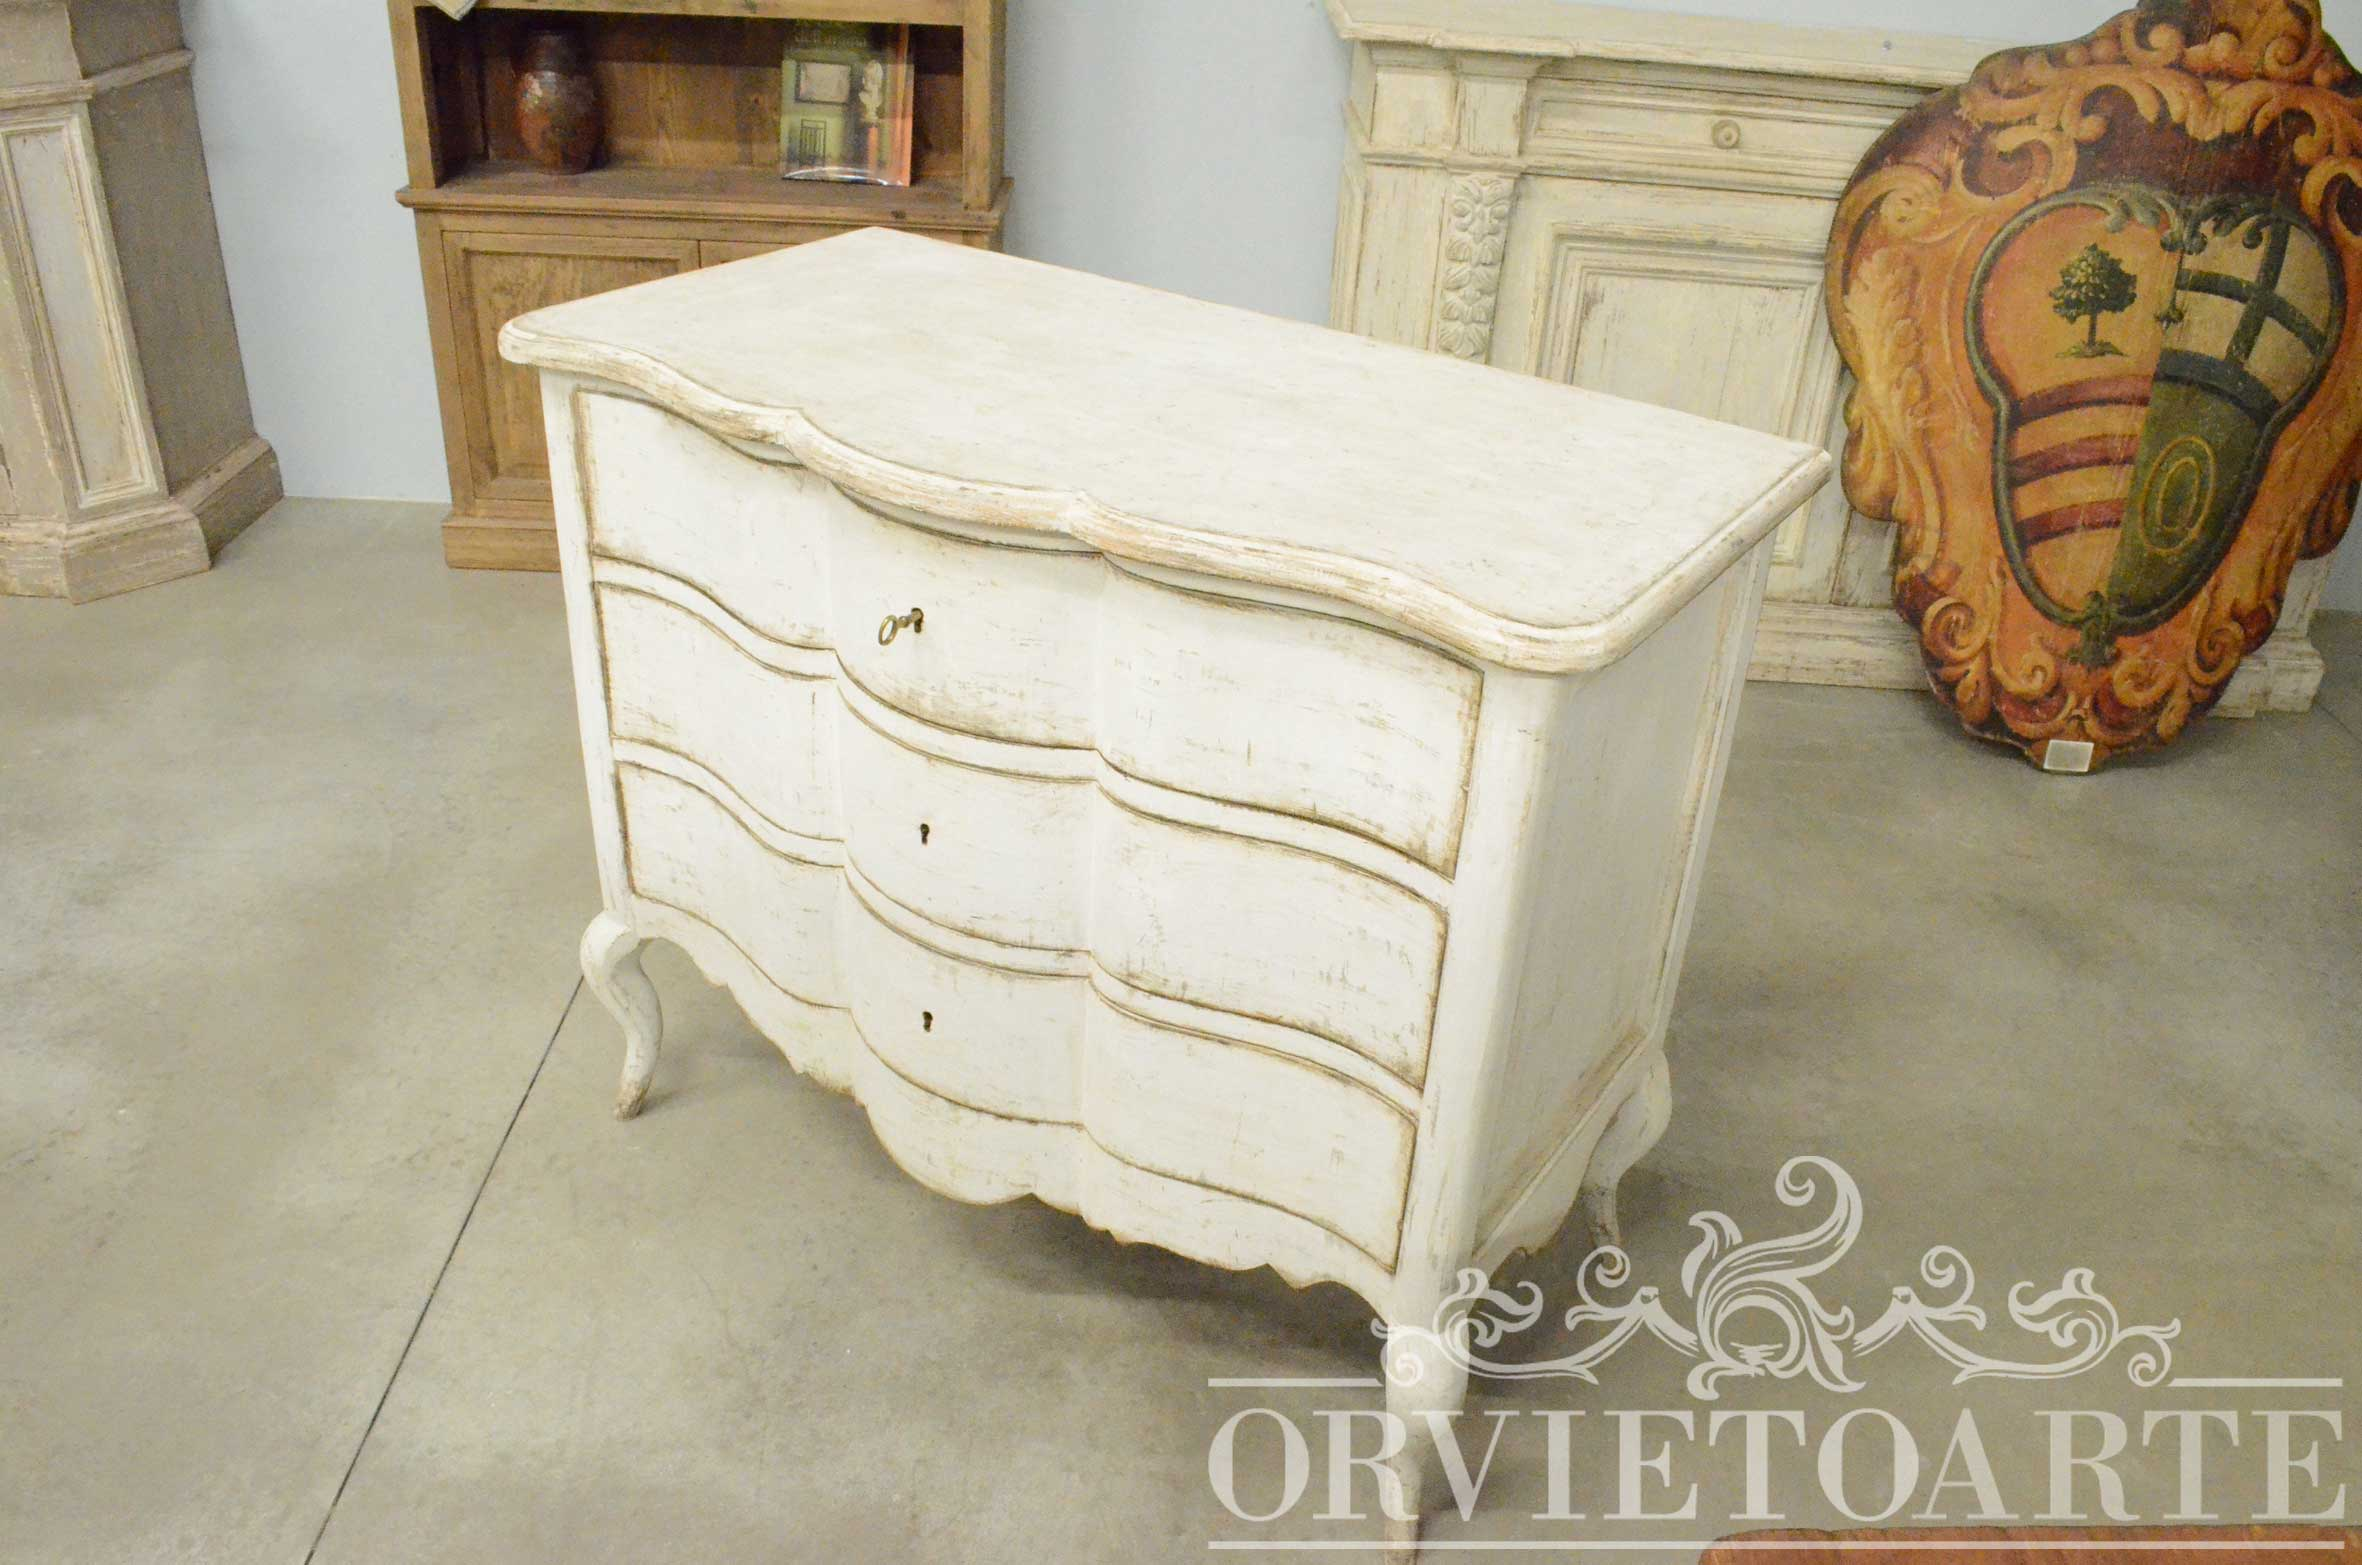 Orvieto arte com bianco decap stile shabby chic for Mobile vintage bianco